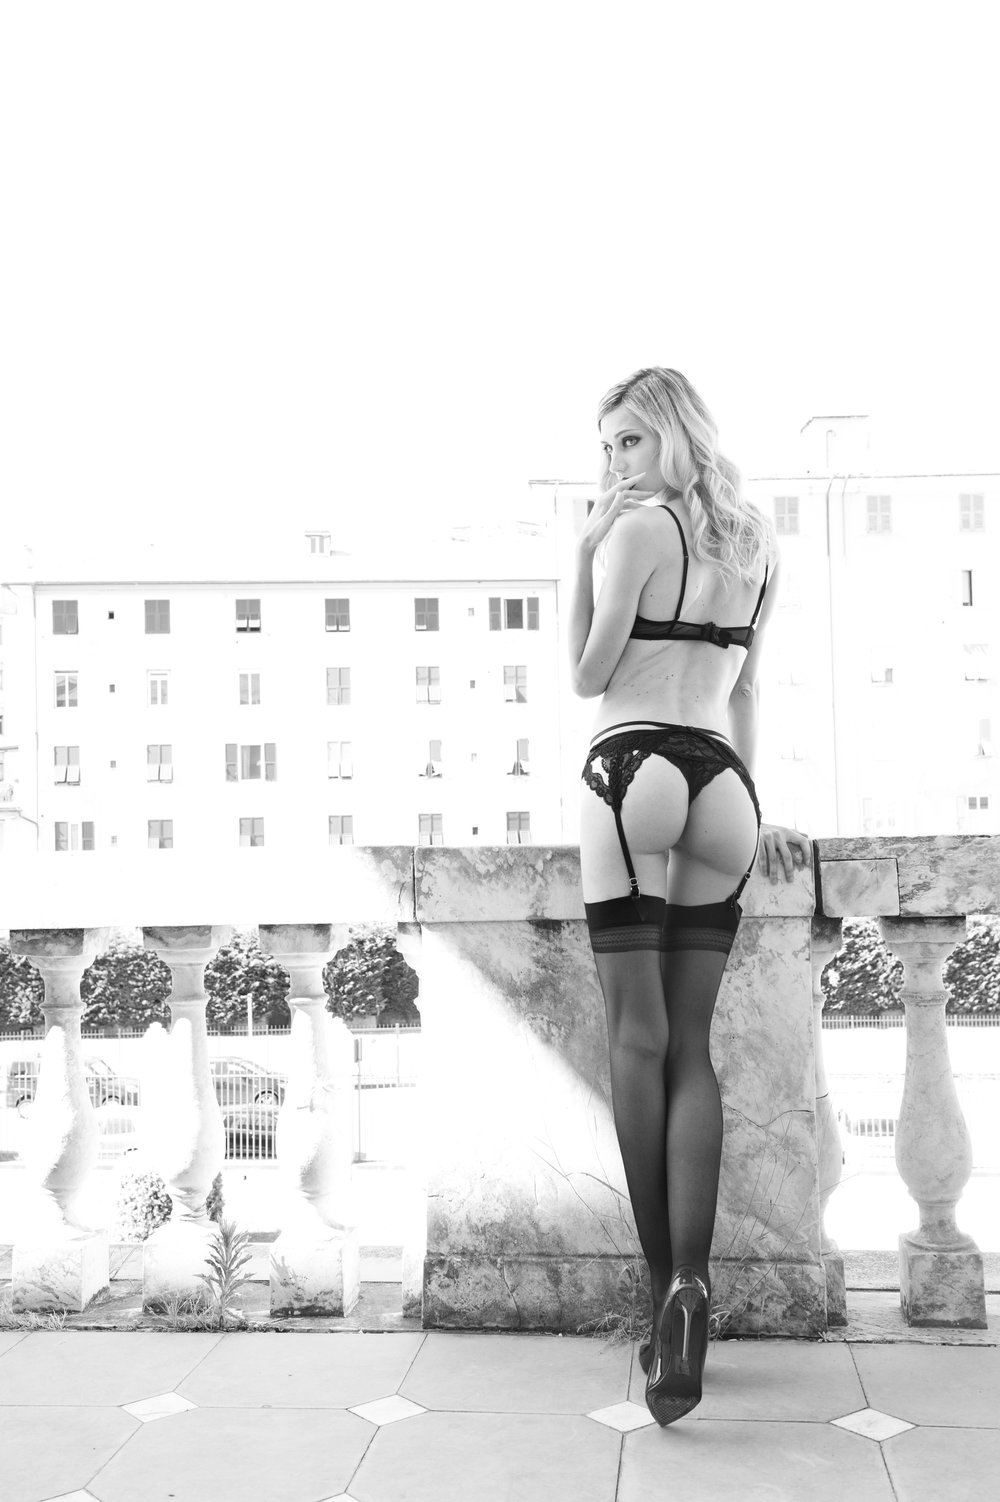 Photographer: Alfredo Sabbatini